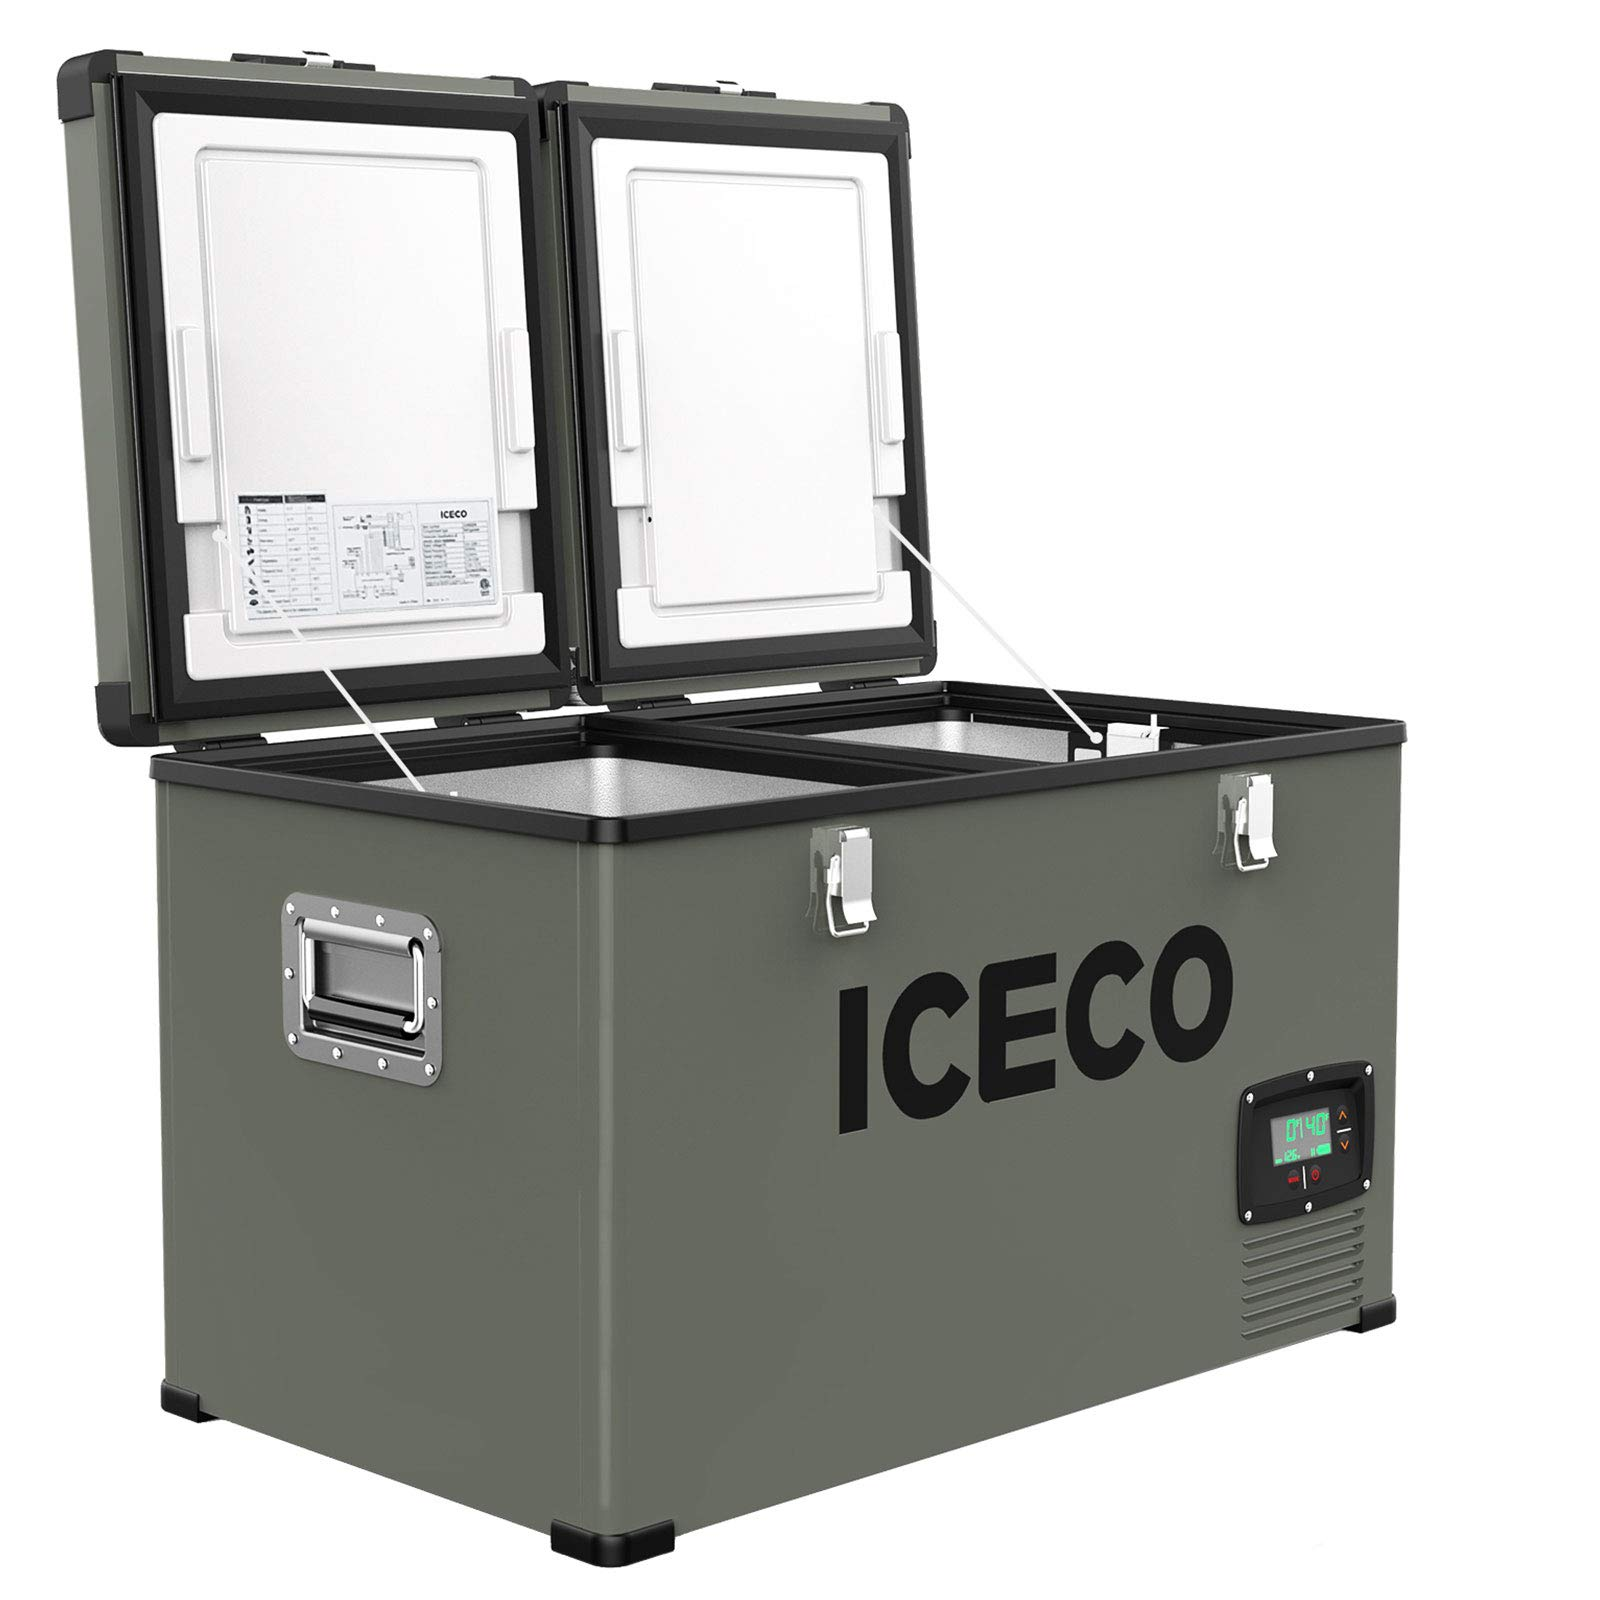 ICECO VL60 Dual Zone Portable Refrigerator with SECOP Compressor, 60 Liters Platinum Compact Refrigerator, DC 12/24V, AC 110-240V, 0℉ to 50℉, Home & Car Use (with Insulated Cover)